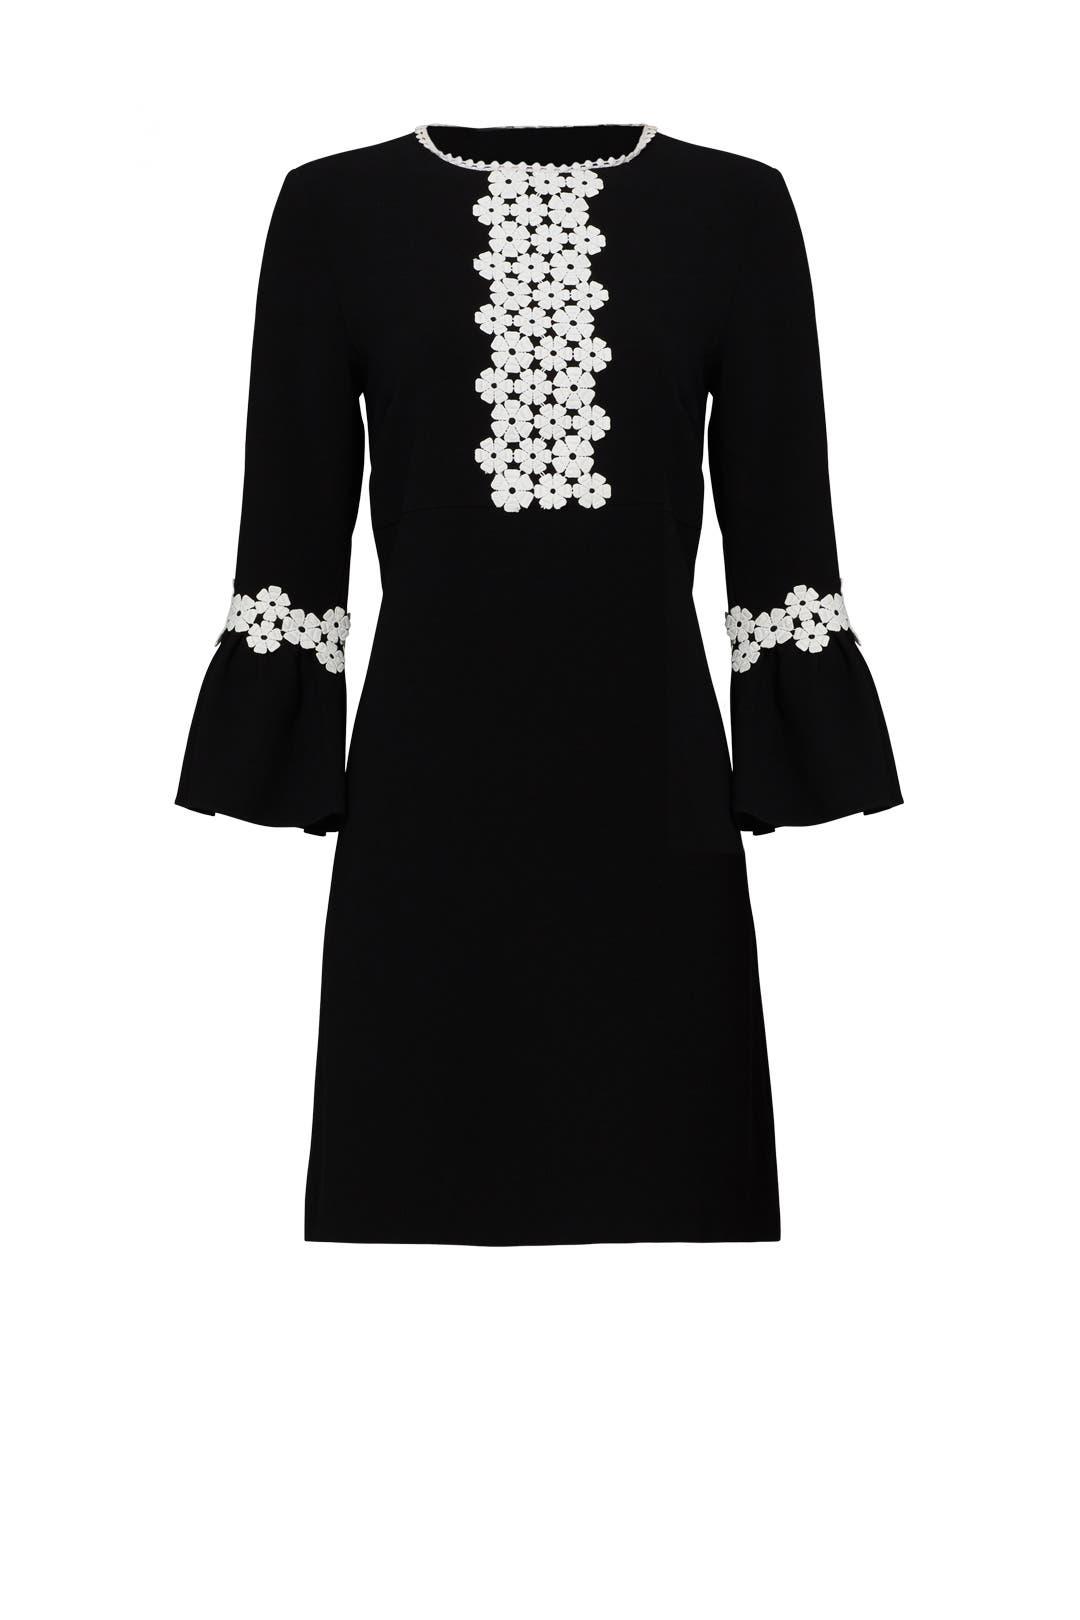 White Flower Dot Dress By Shoshanna For 60 Rent The Runway